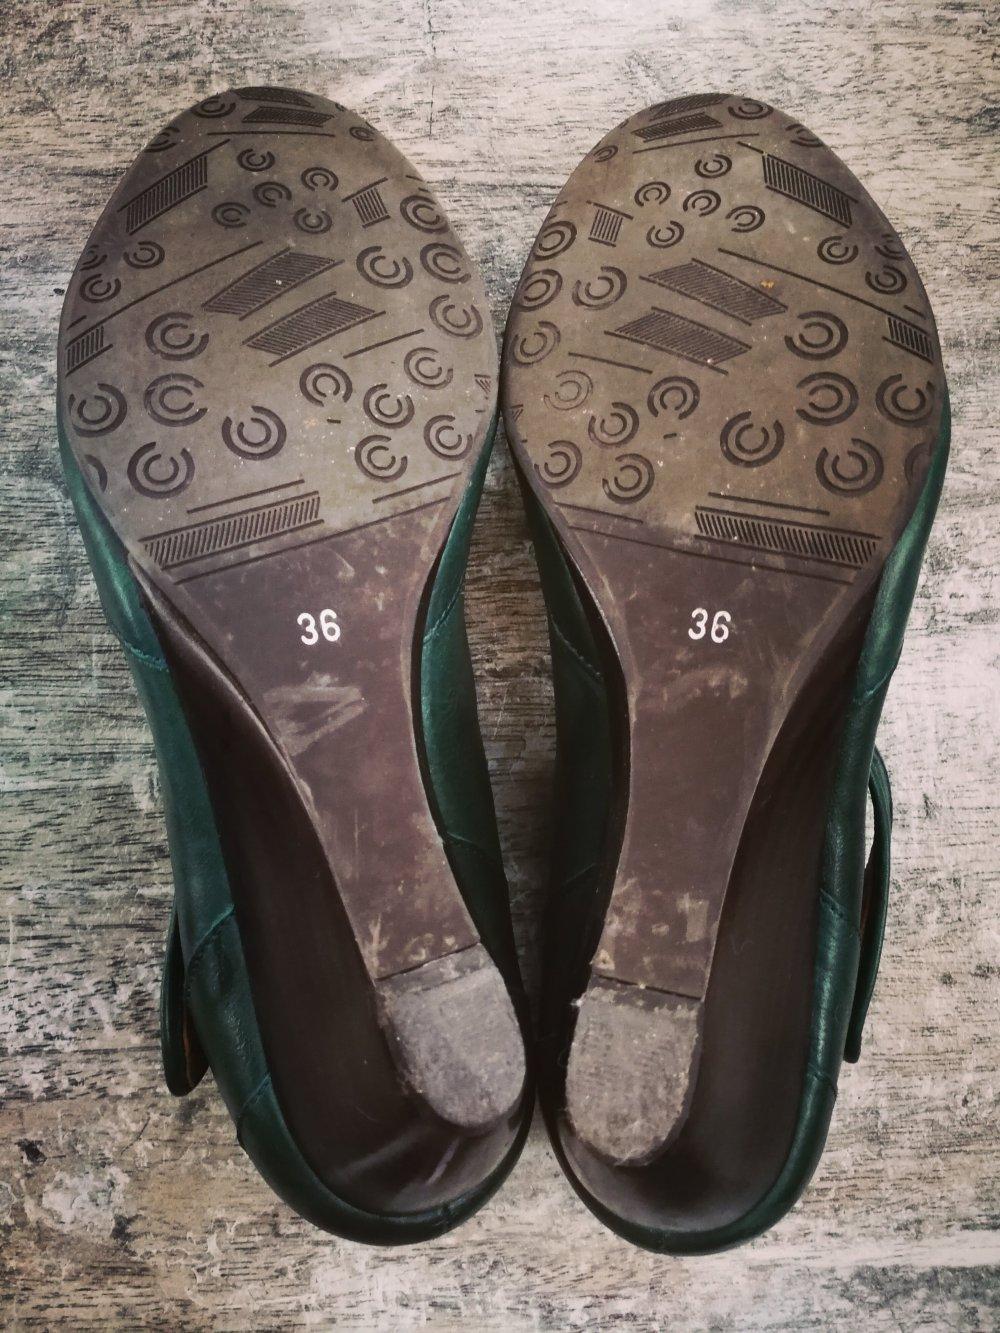 Görtz Shoes Keilabsatz Pumps Leder dunkelgrün 36    Kleiderkorb.de d00b7fa7ad